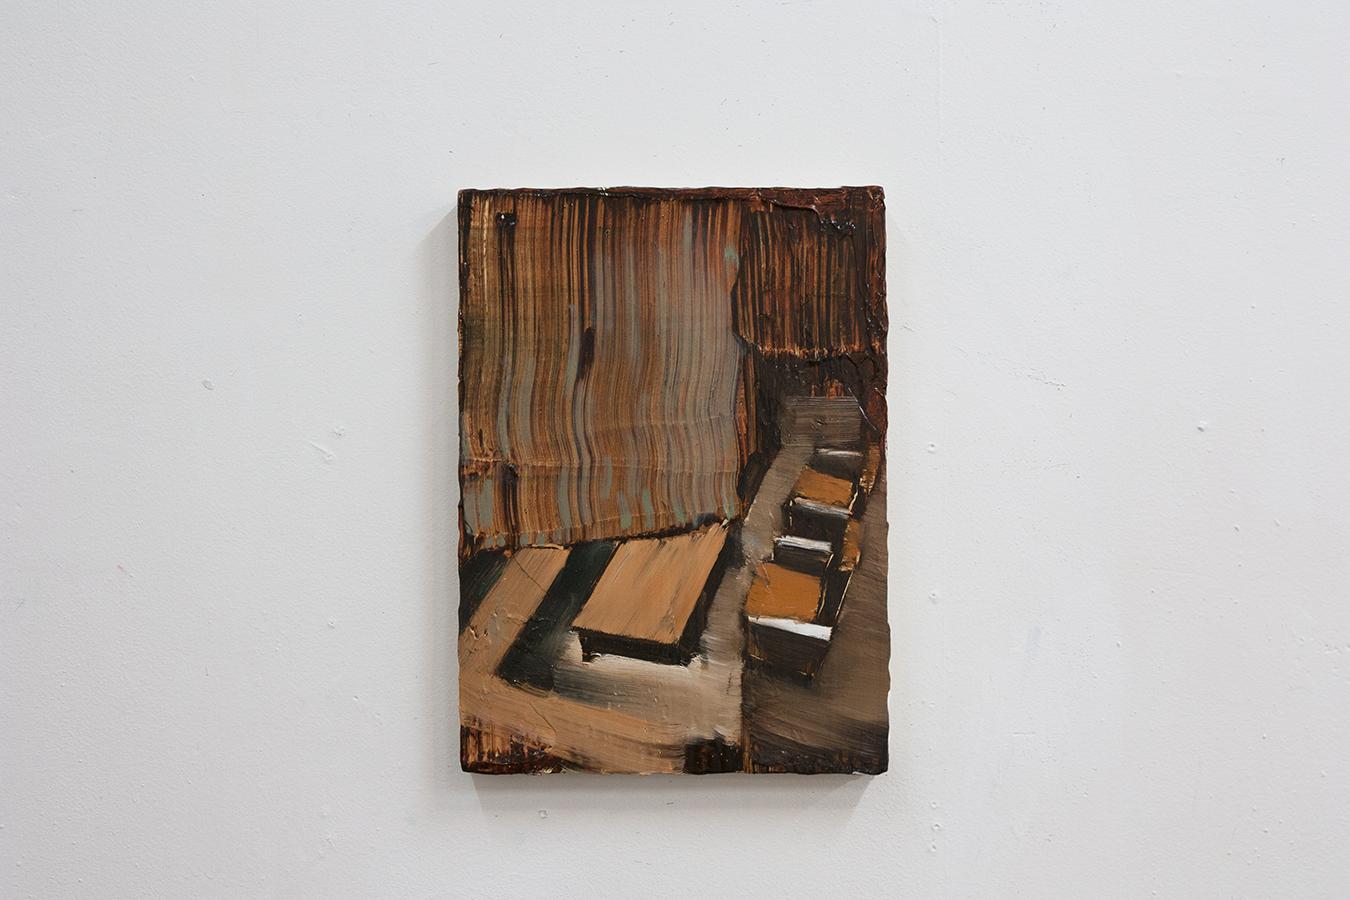 bartosz beda studio, paintings, bartosz beda art, bartosz beda artist, artist studio, bartosz beda, silent interior